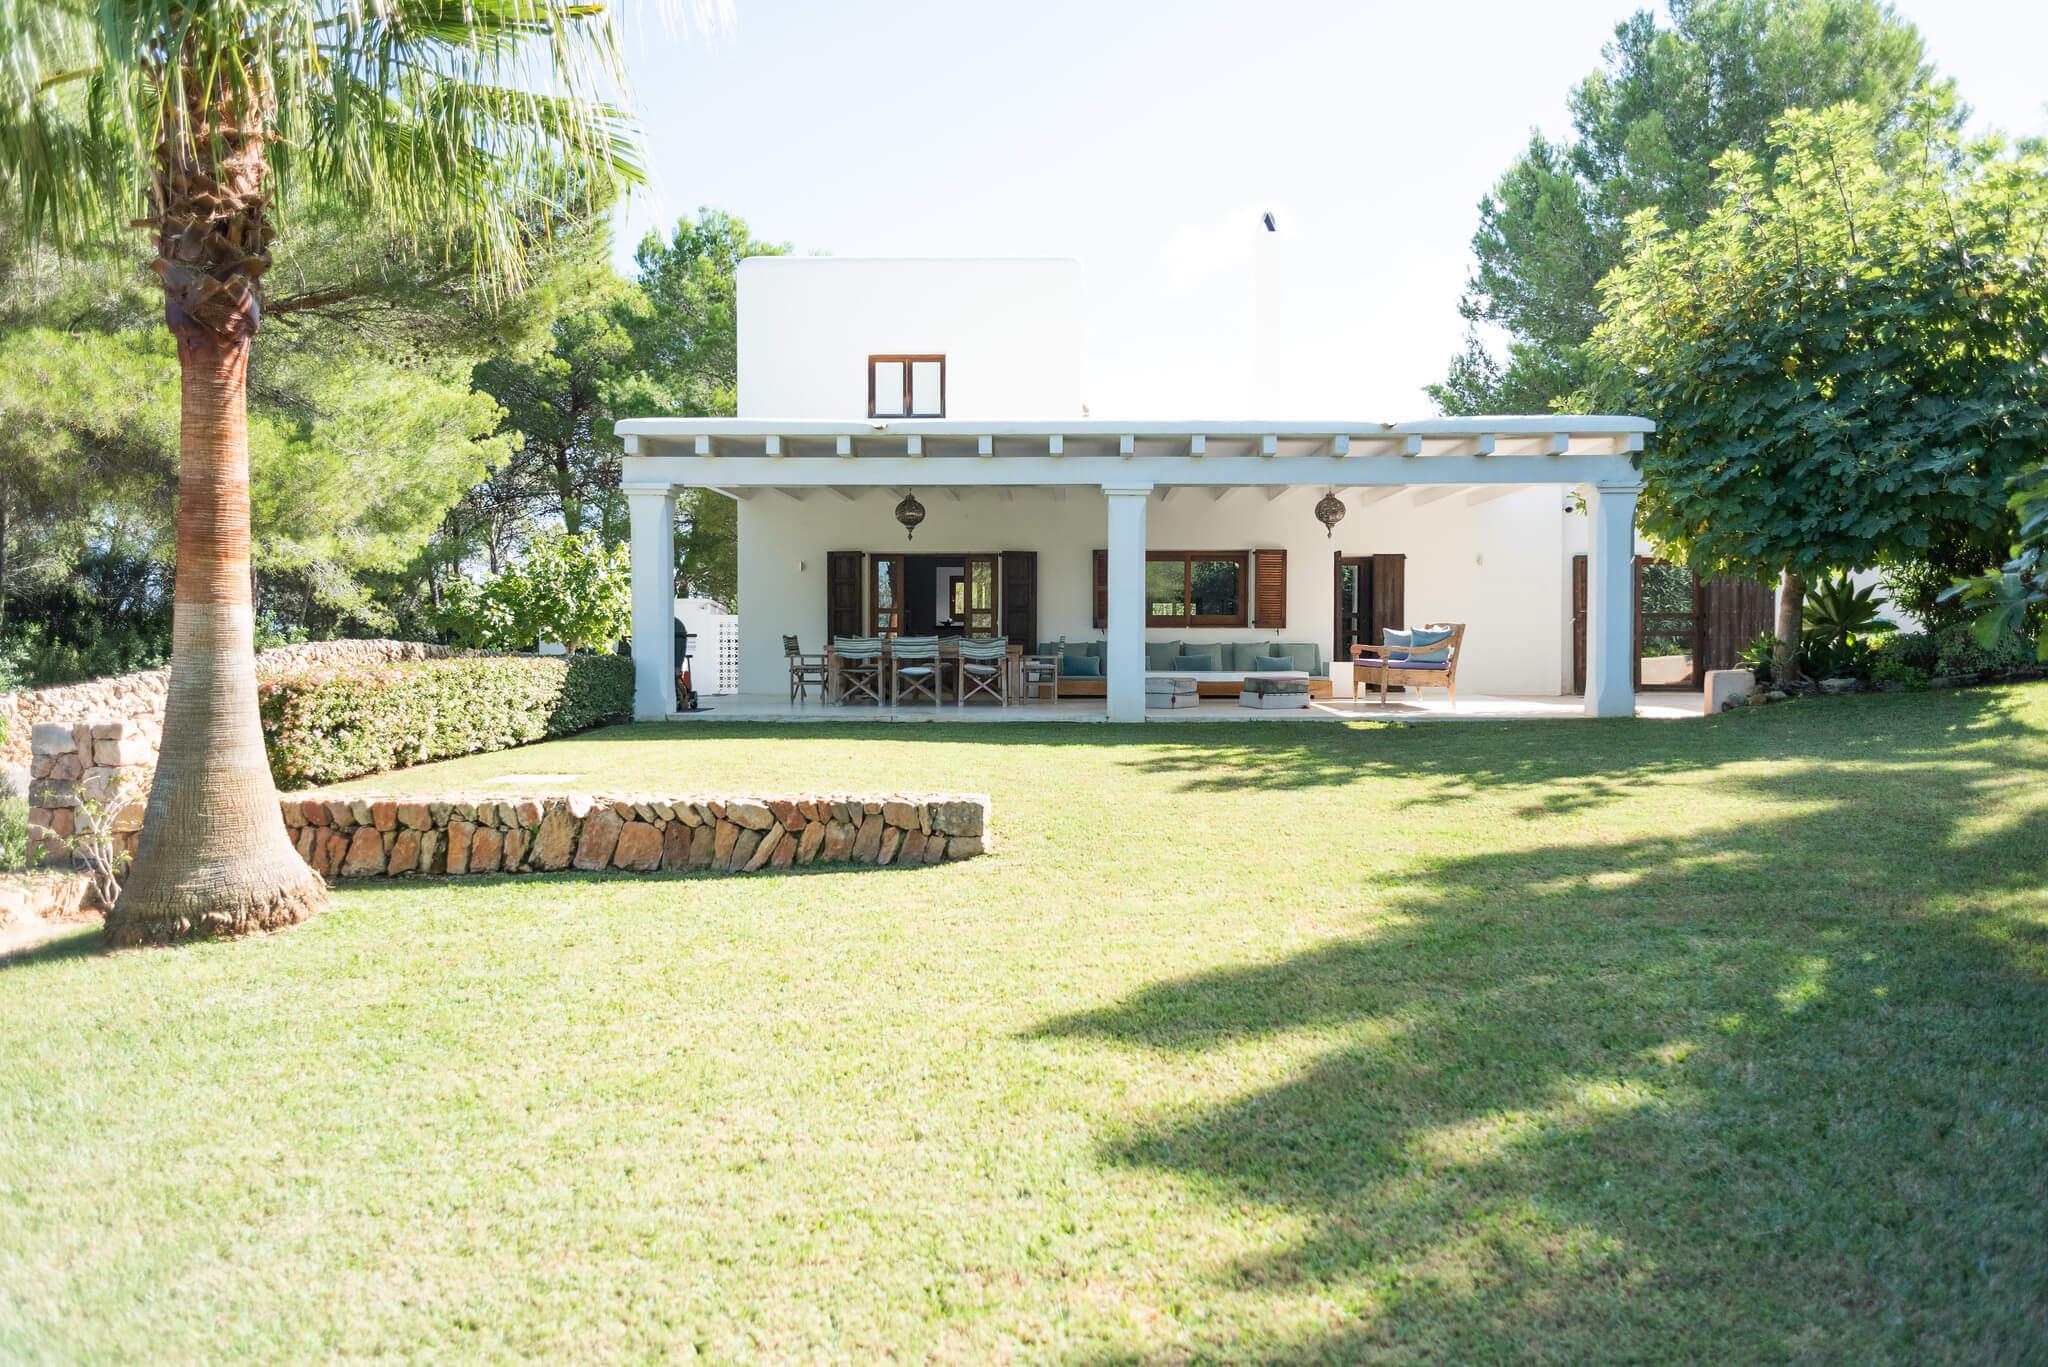 https://www.white-ibiza.com/wp-content/uploads/2020/06/white-ibiza-villas-casa-arabella-exterior-lawn-afar.jpg